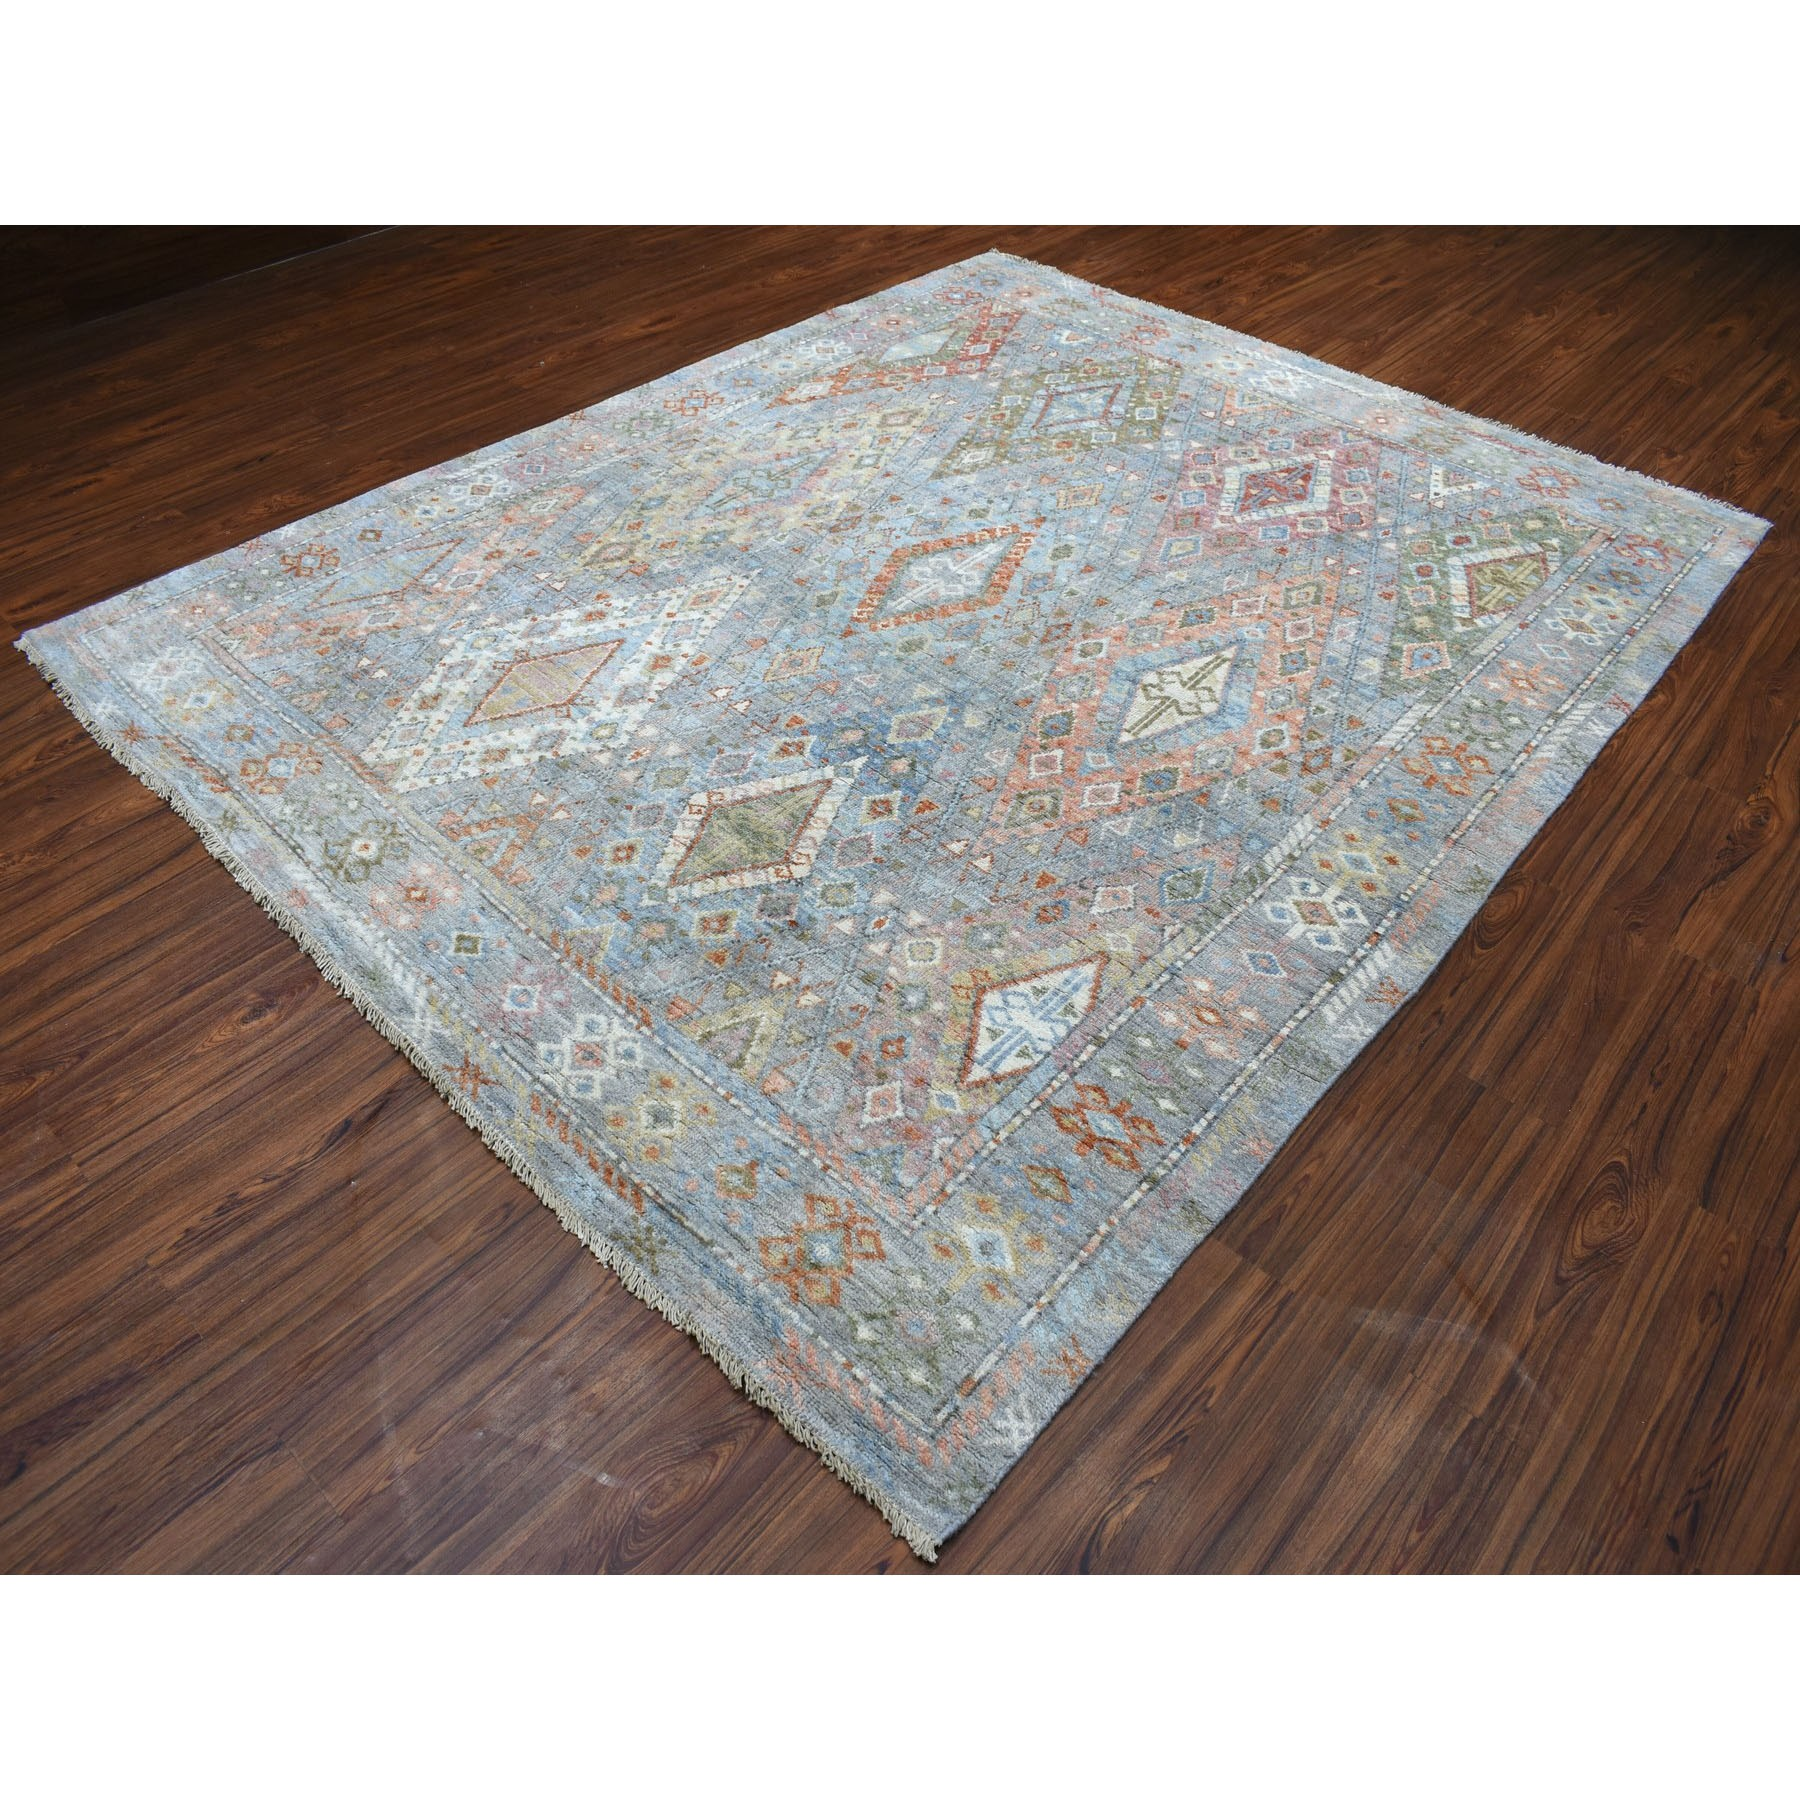 8'x10' Anatolian Collection Geometric Design Turkish Knot Oushak Soft Wool Oriental Rug